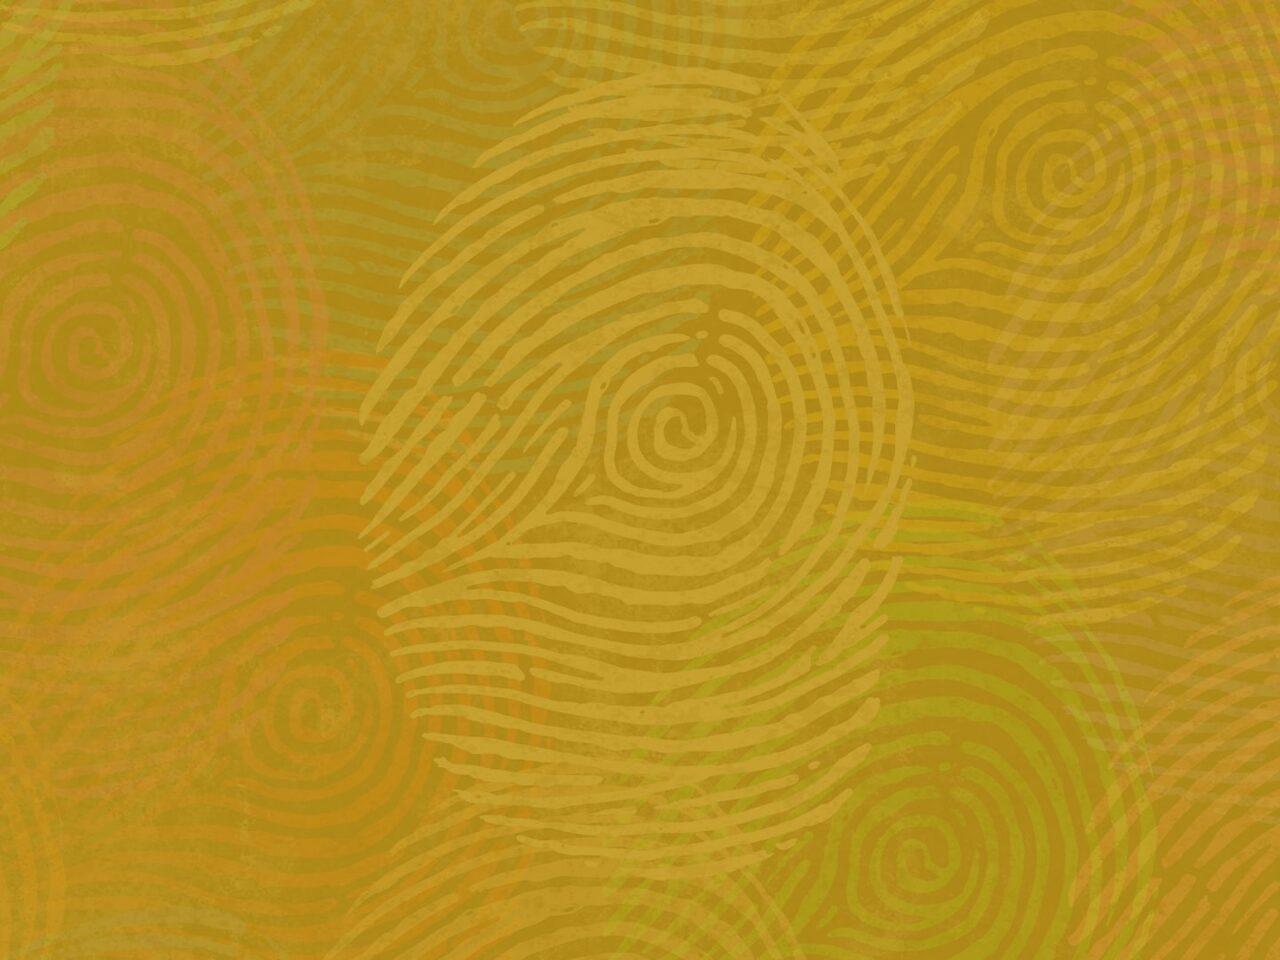 http://www.nbct.org.uk/wp-content/uploads/2021/06/gold_finger_prints_1920-min-1280x960.jpg